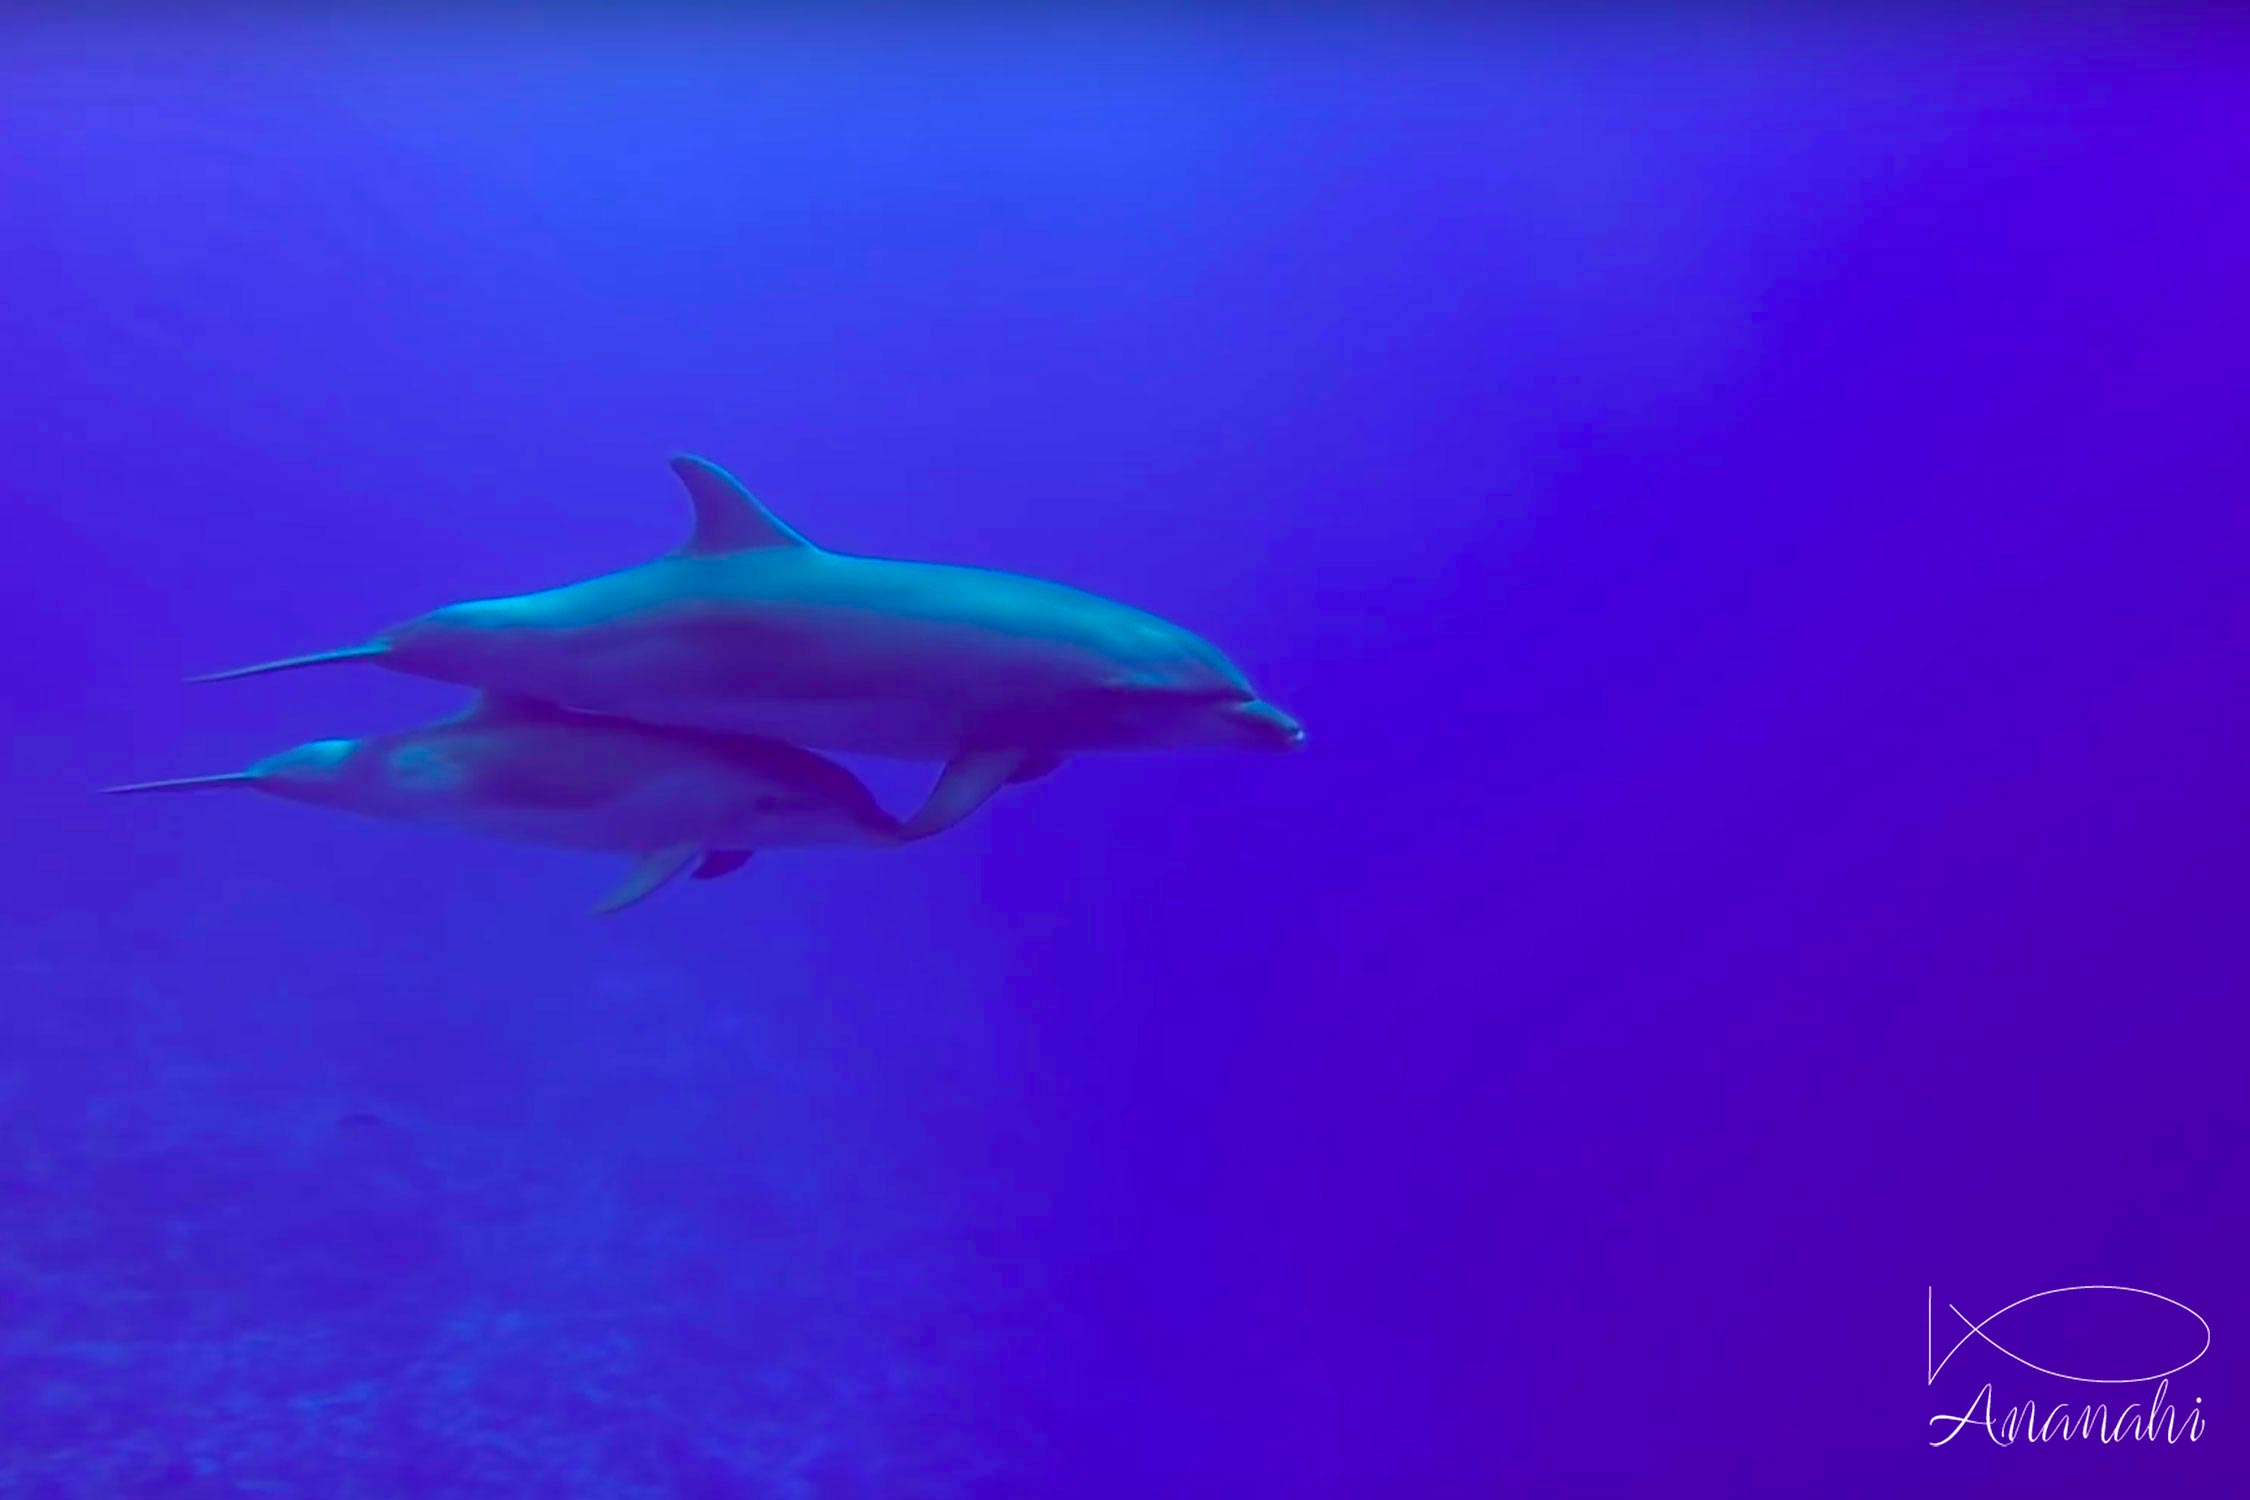 Grand dauphin de Polynésie française